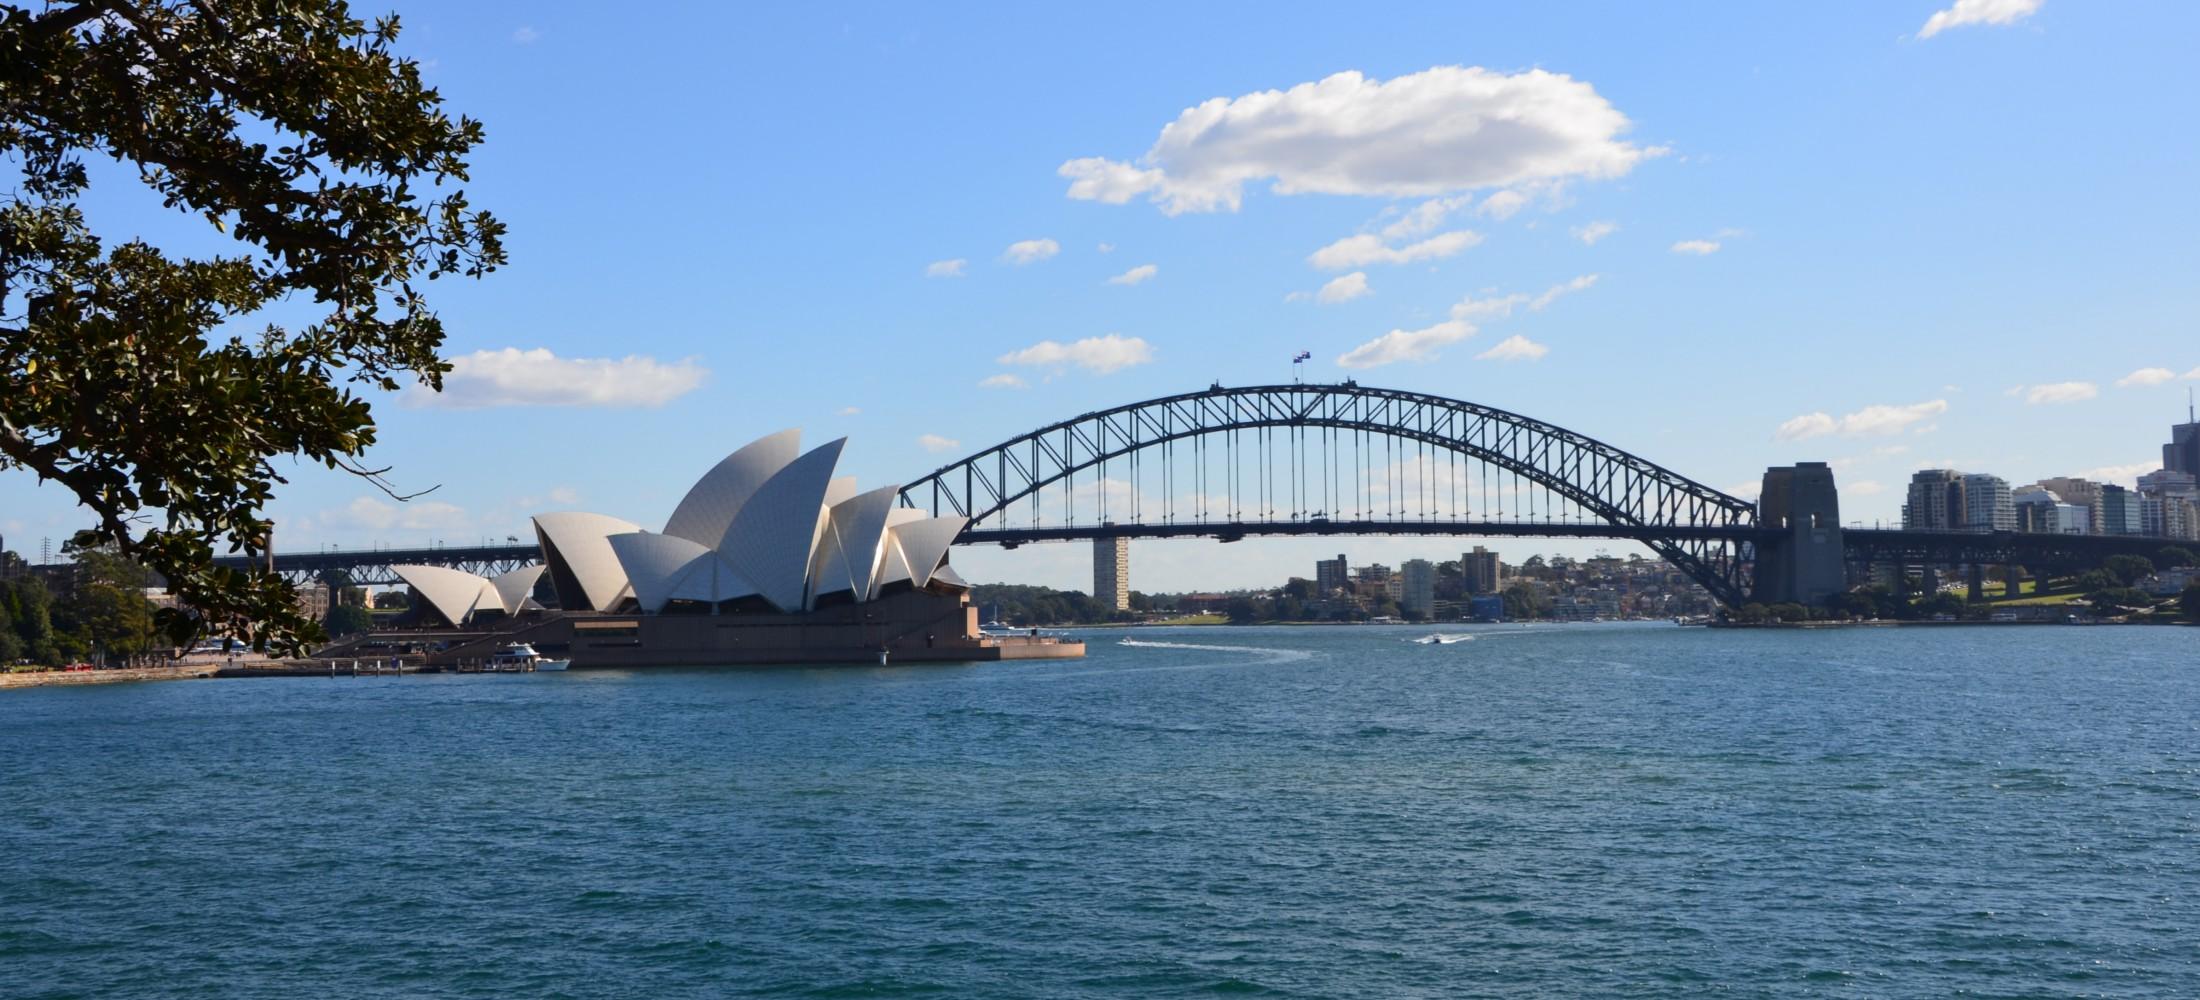 6 Tage in Sydney